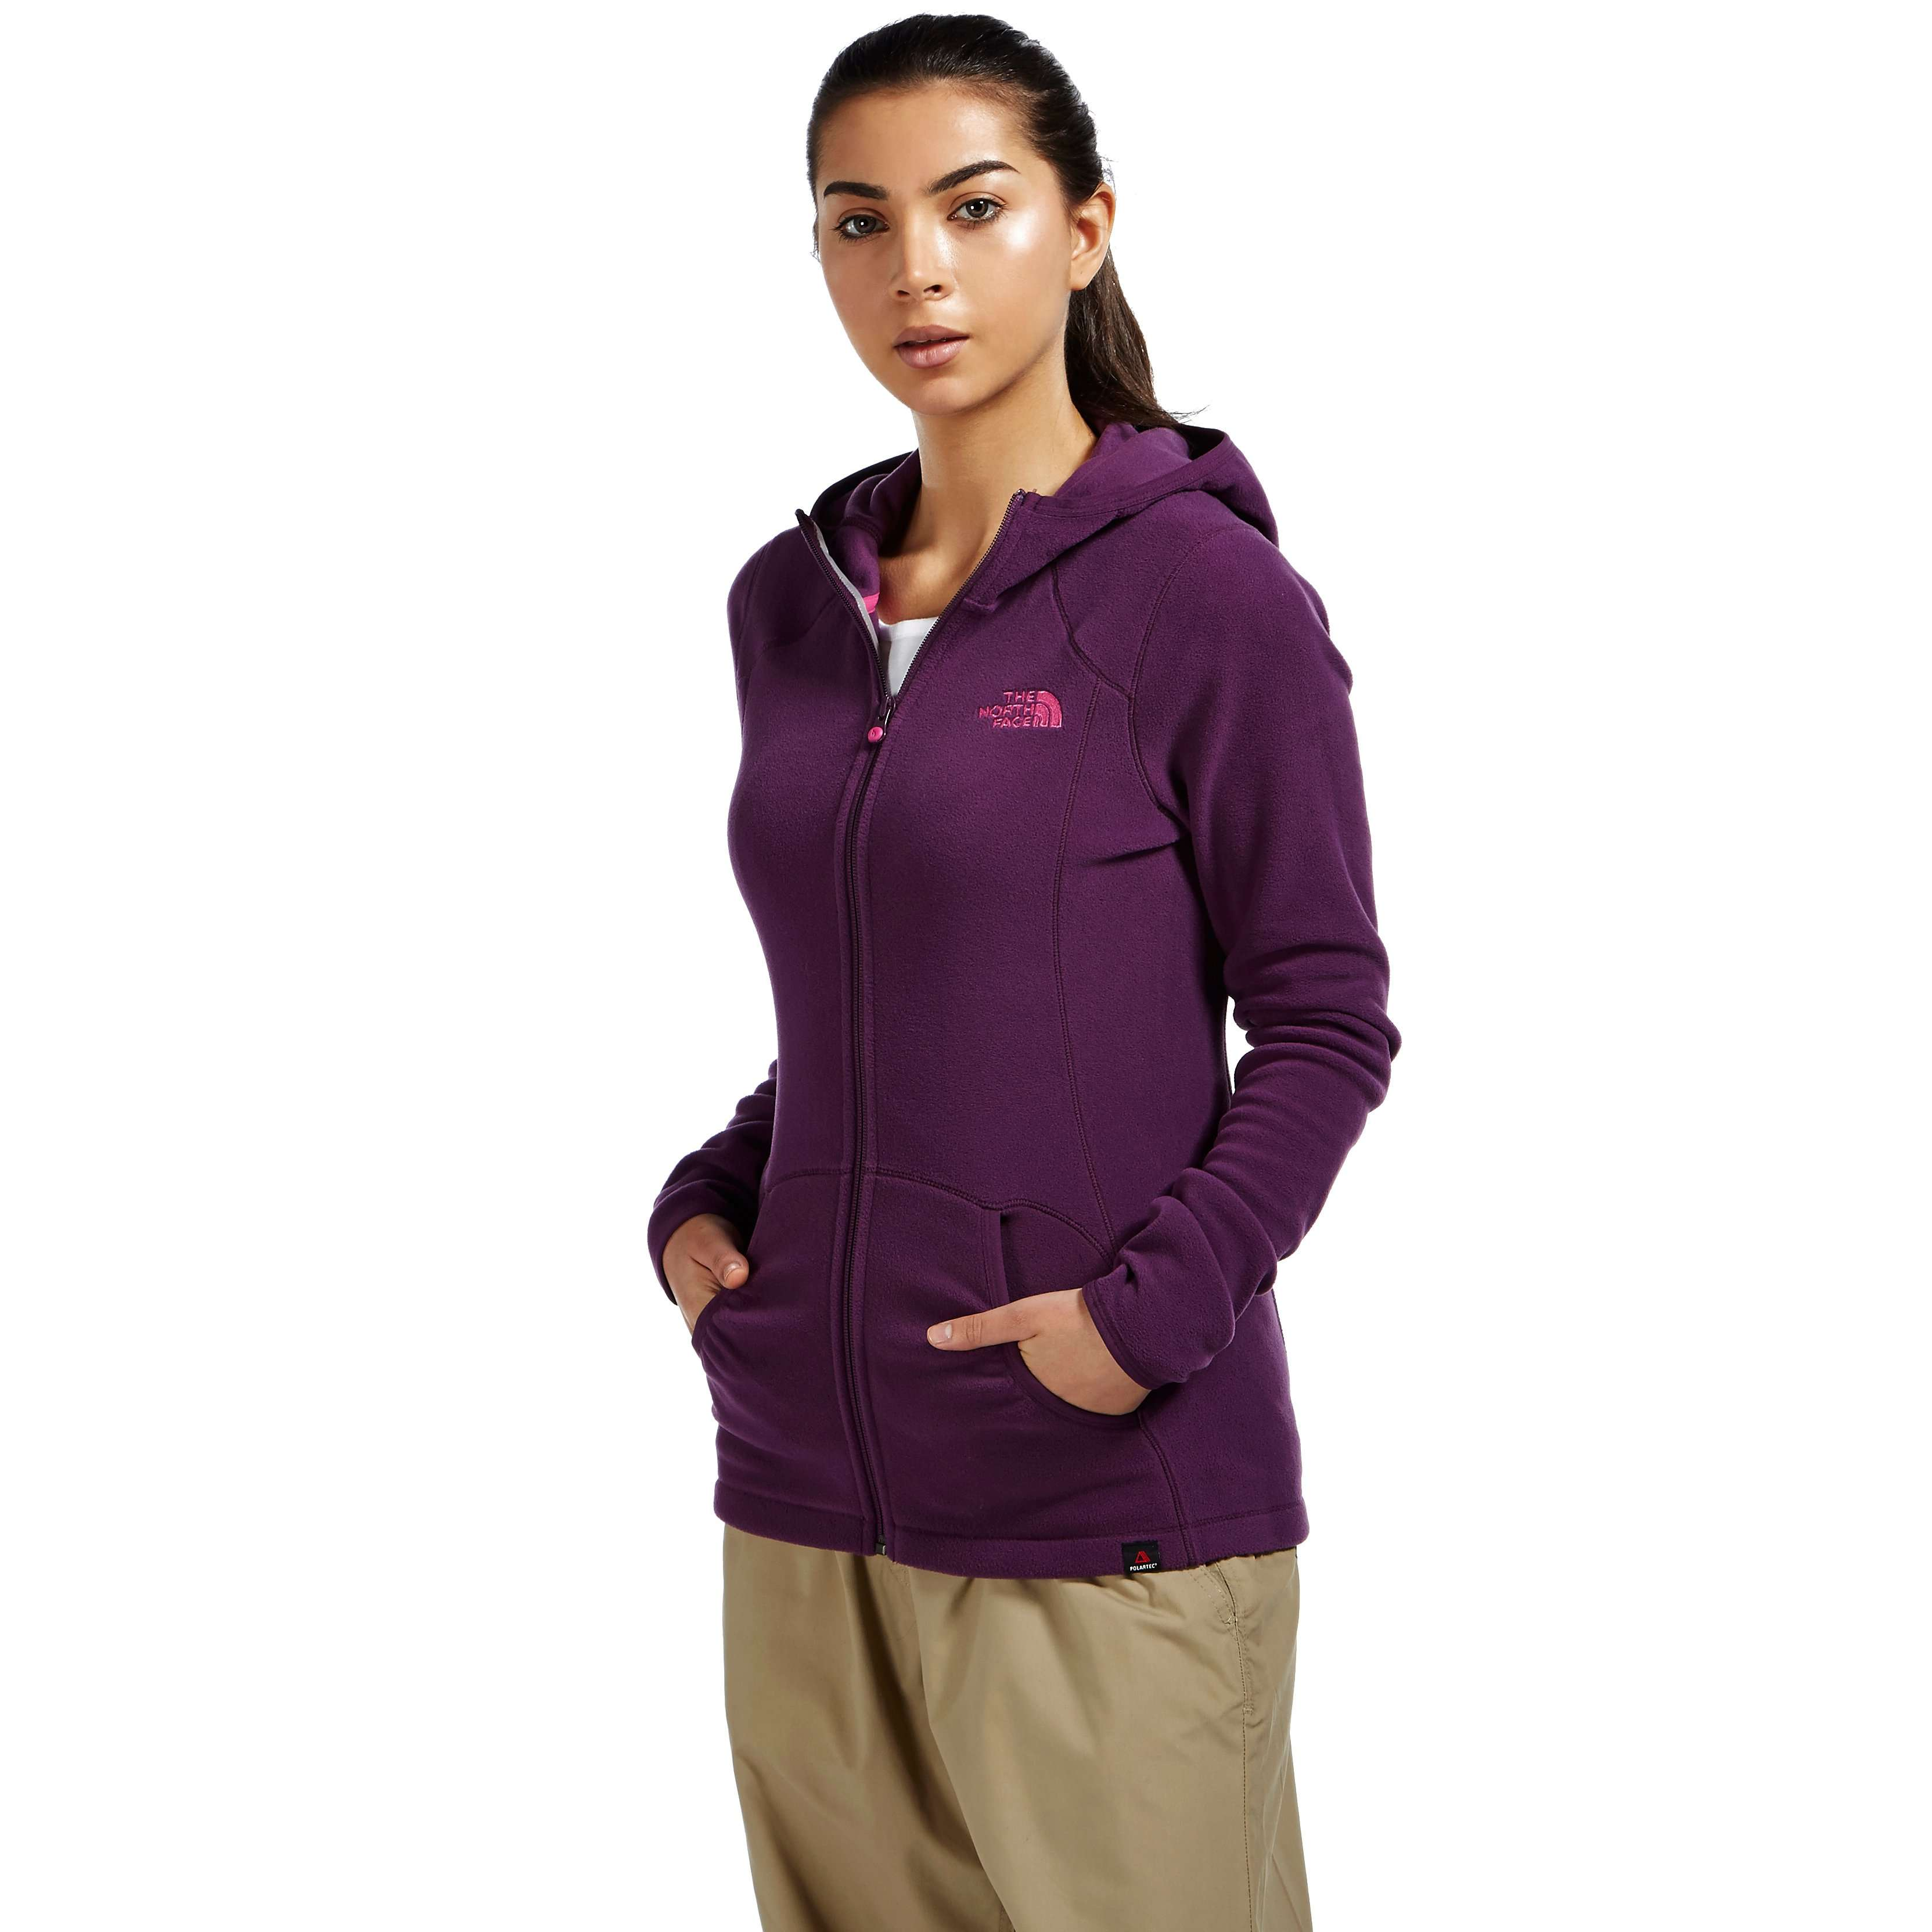 THE NORTH FACE Women's Masonic Full Zip Fleece Hoodie